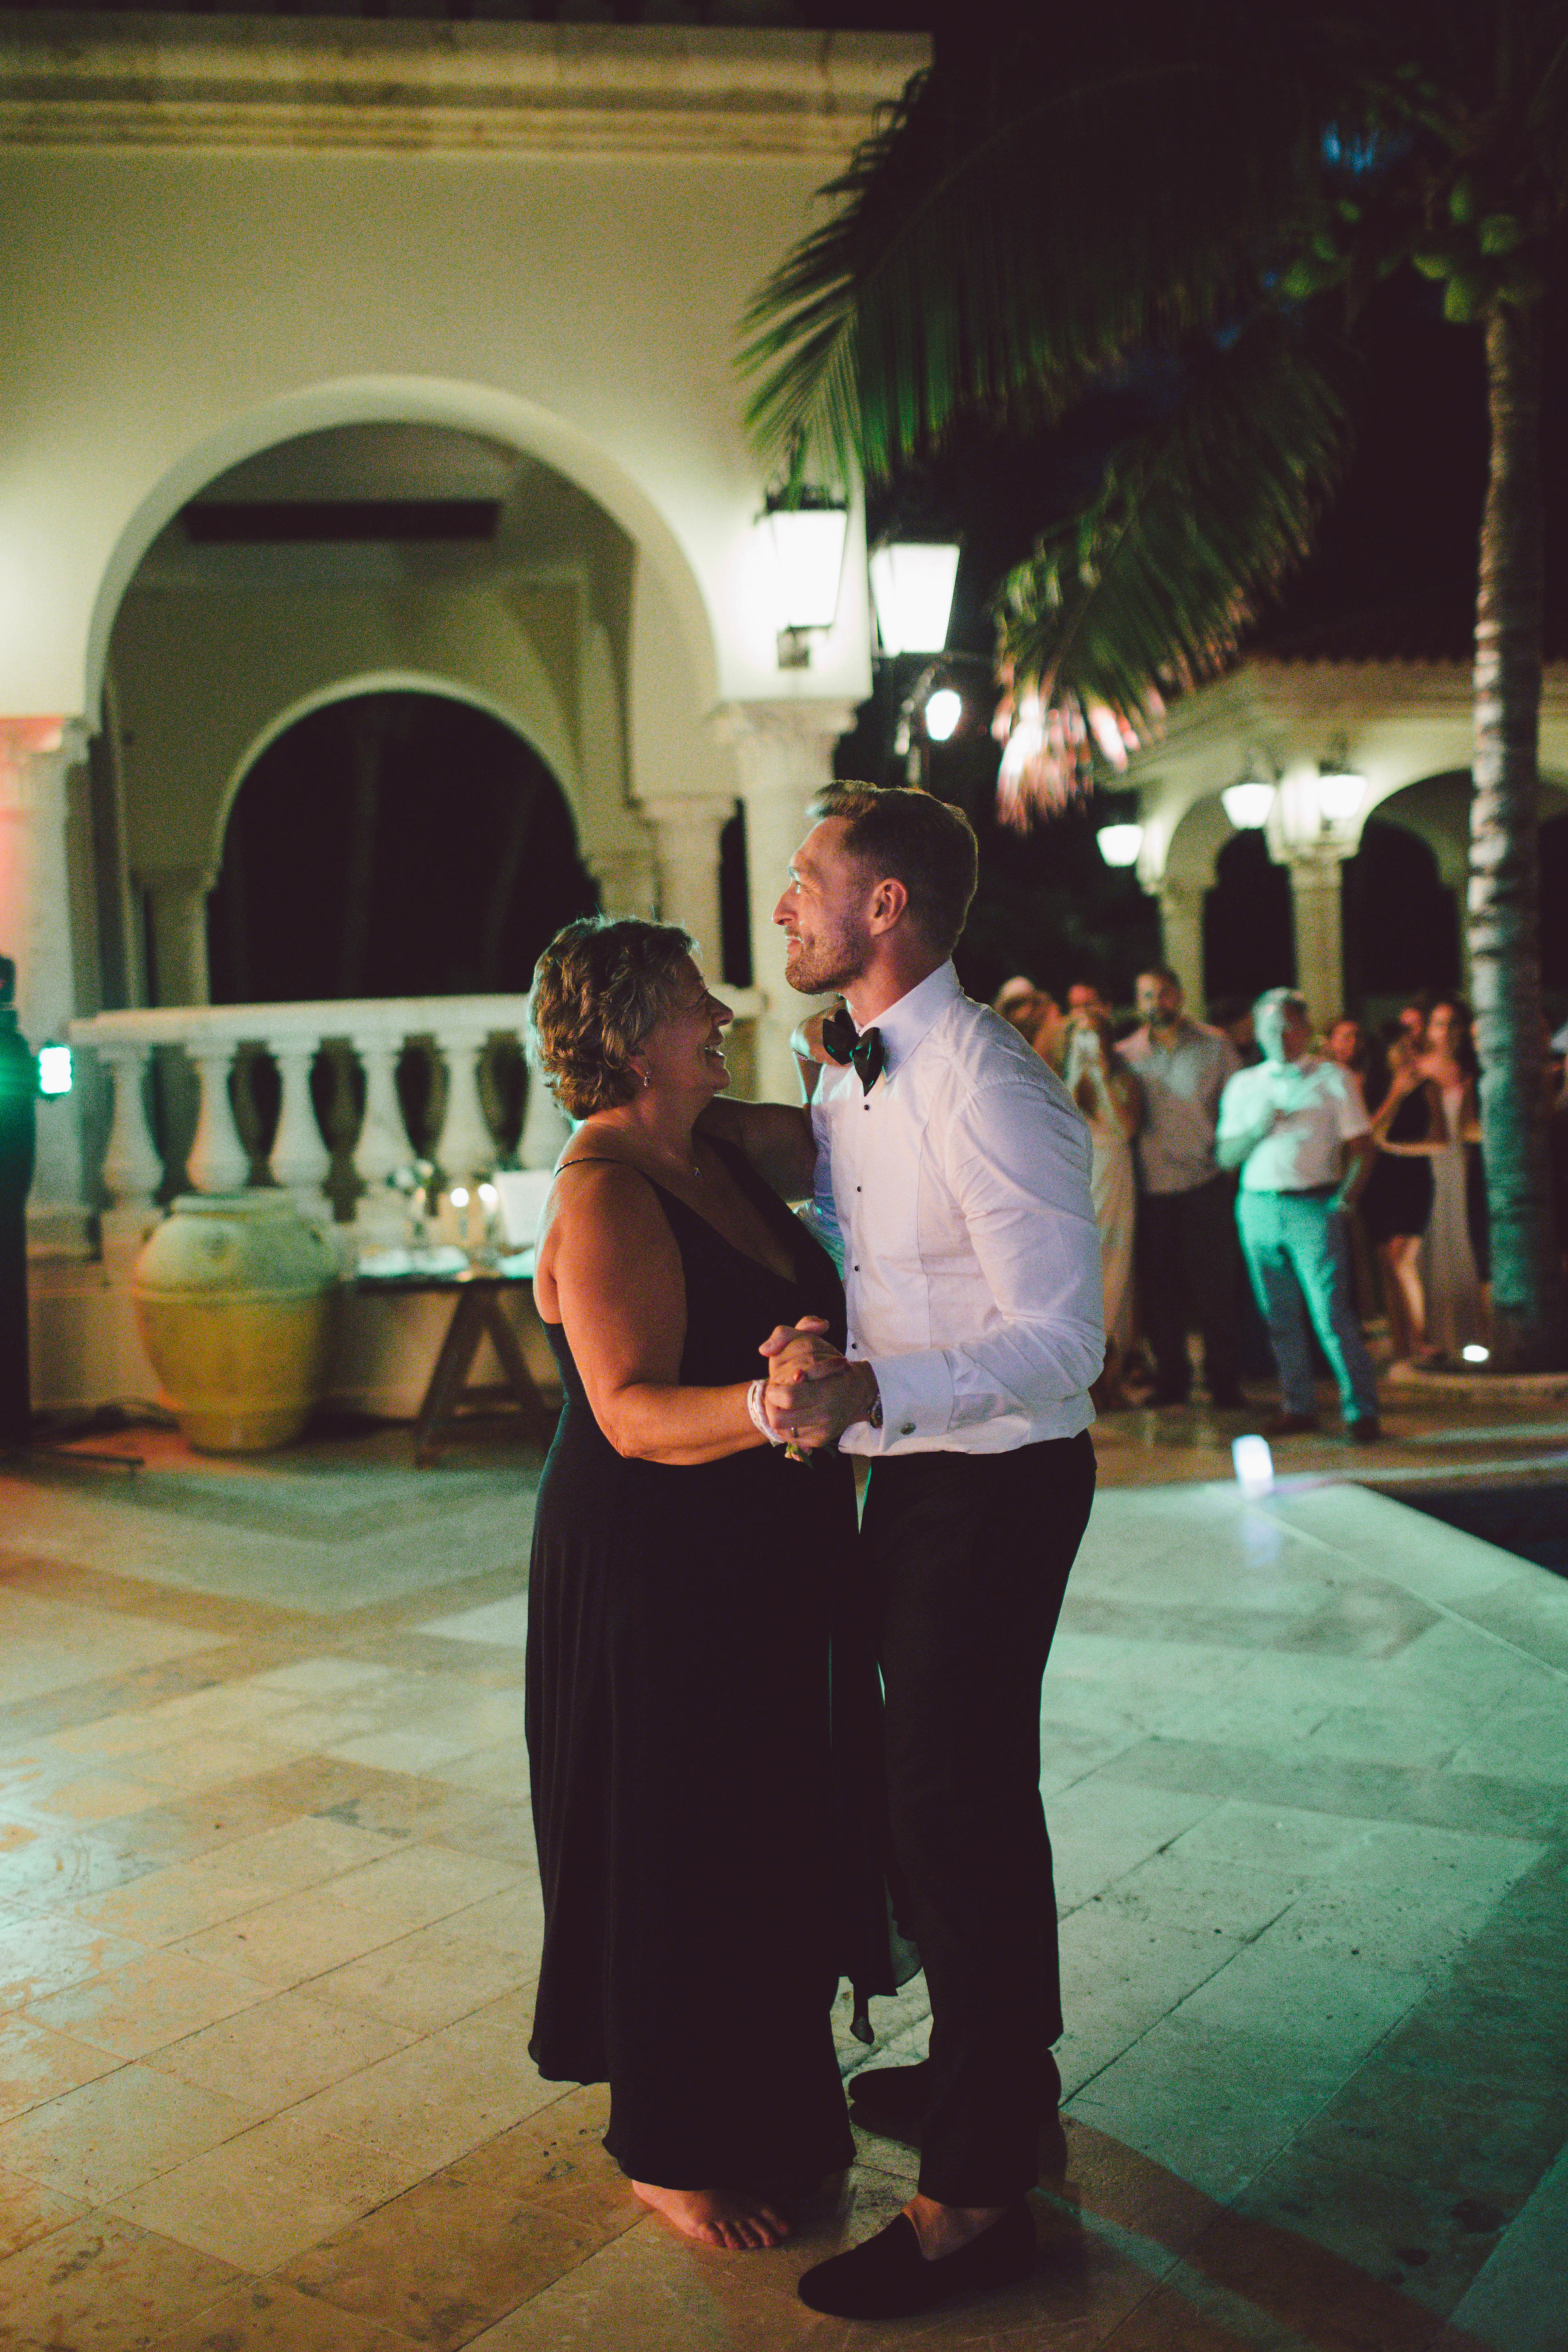 mexico_wedding_cancun_villa_la_joya_evangeline_lane_160.jpg